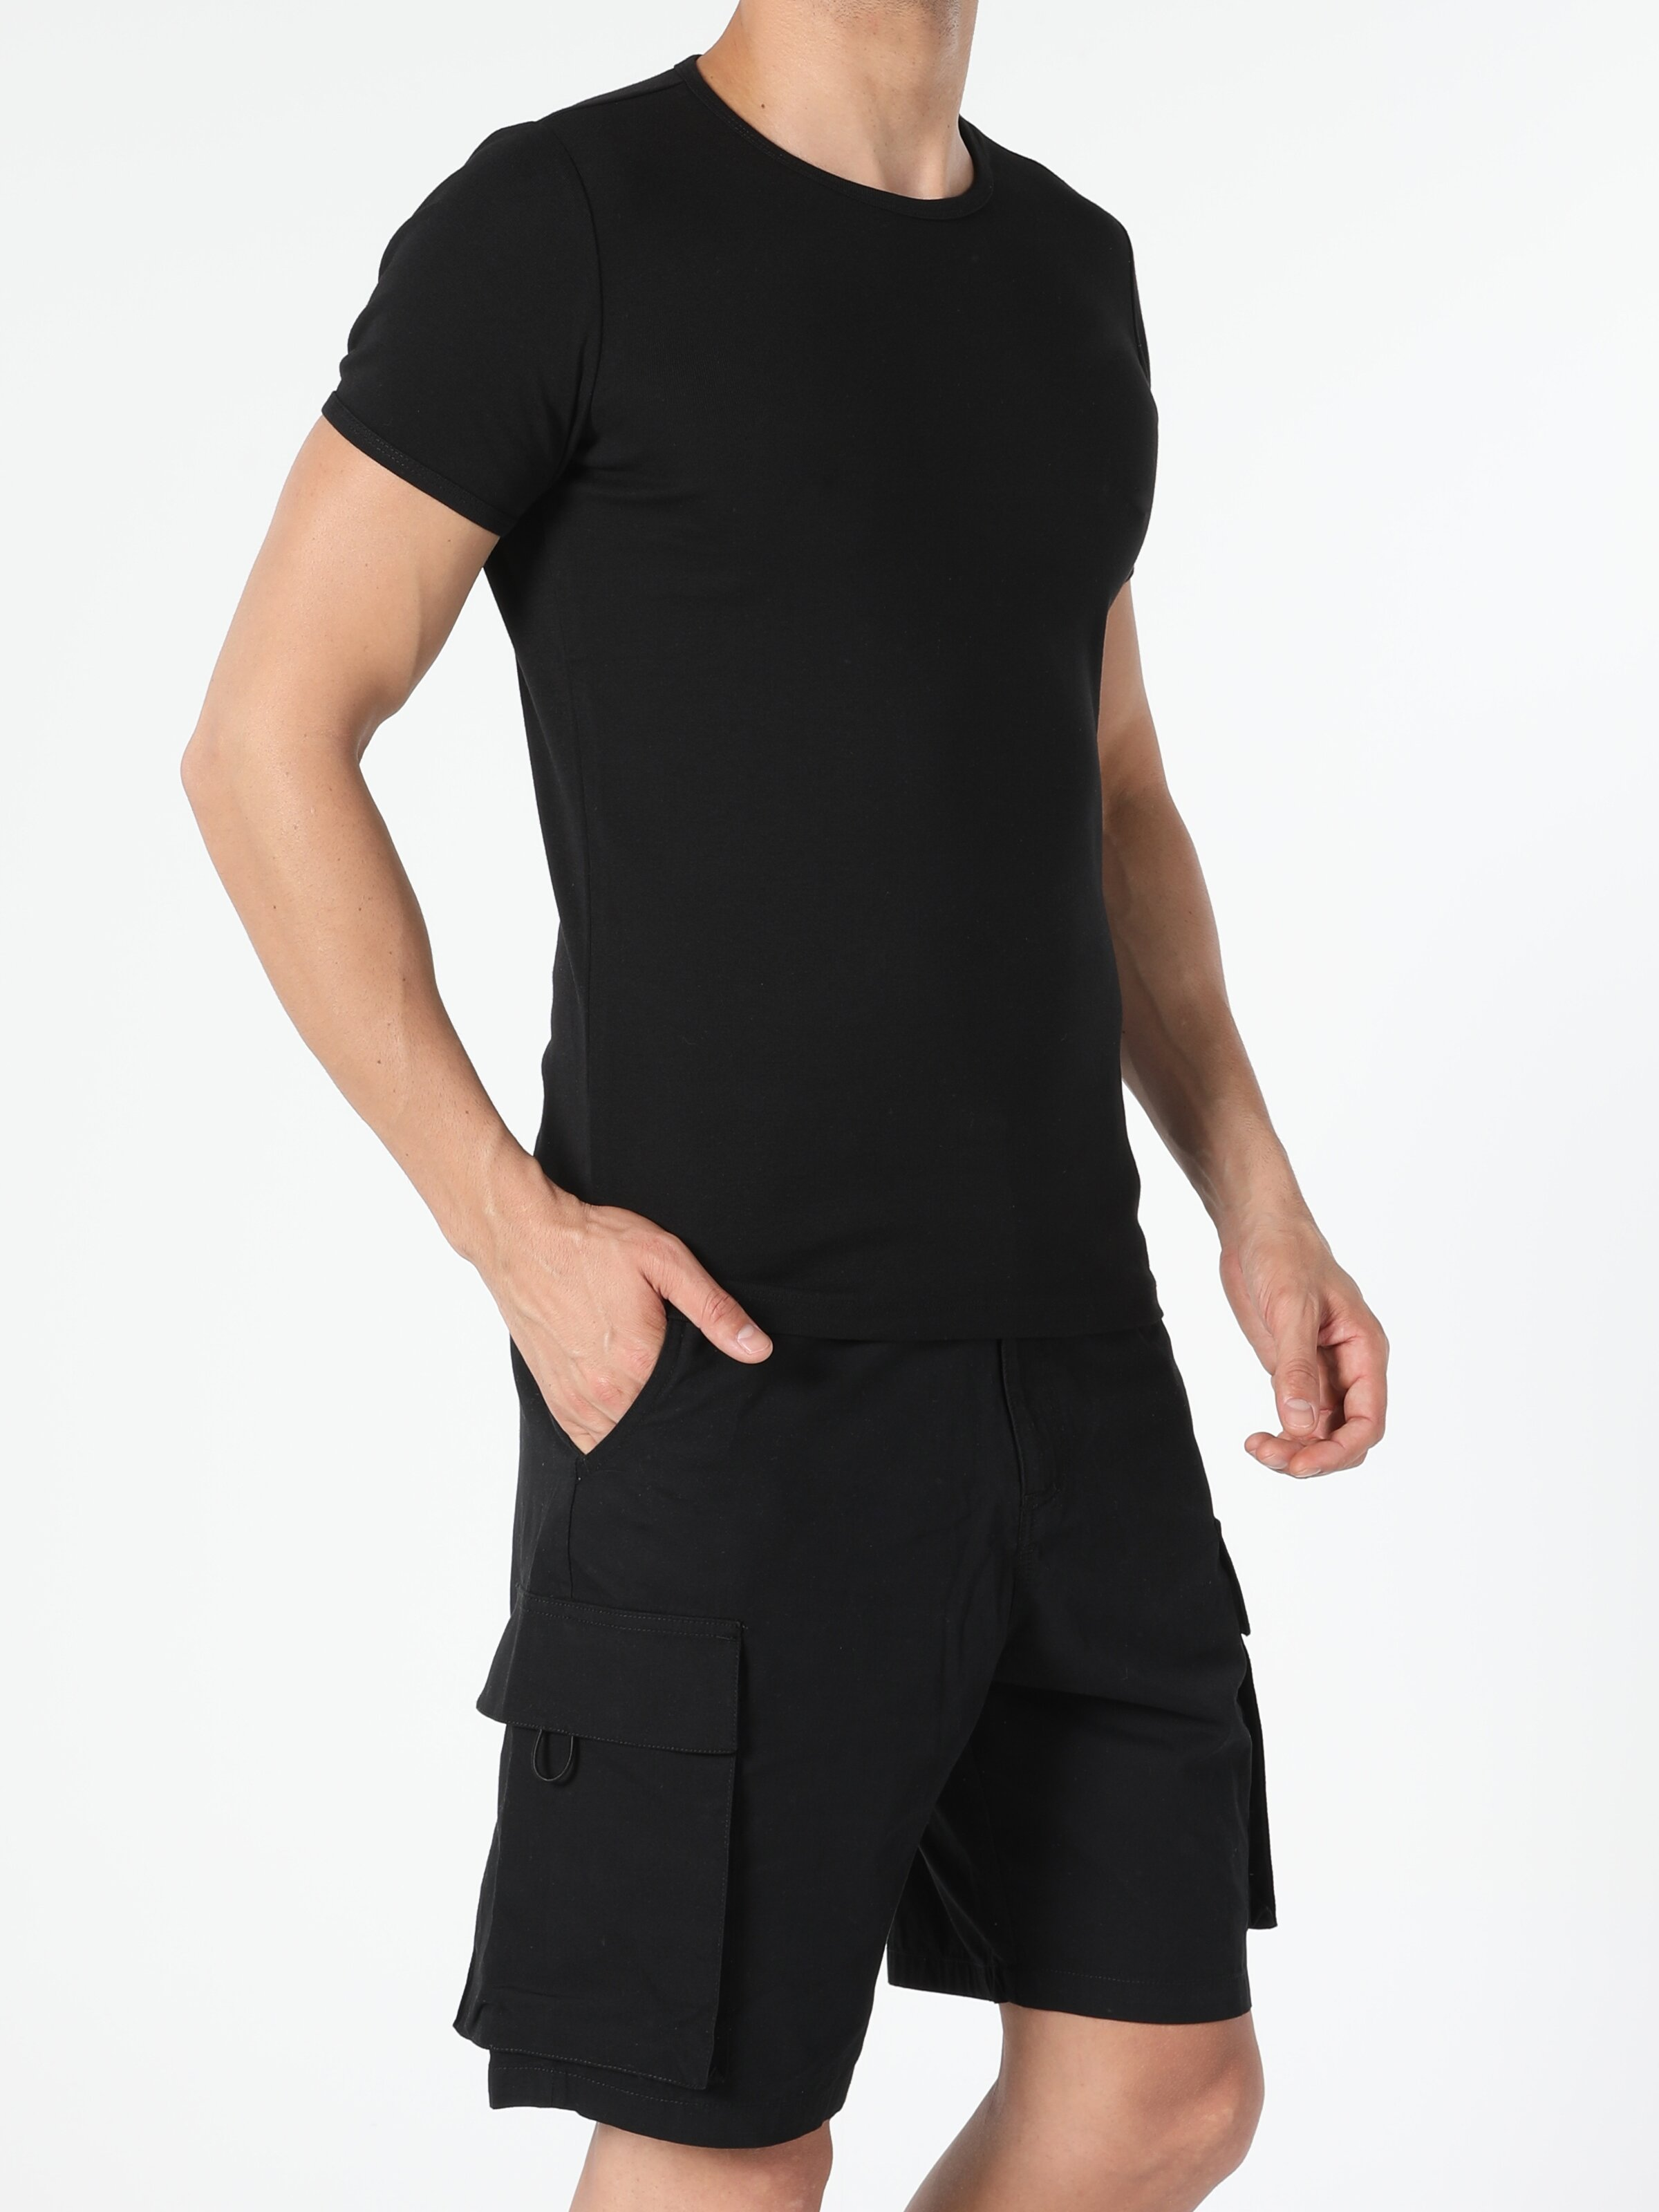 Slim Fit Bisiklet Yaka Örme Erkek Siyah Kısa Kol Tişört